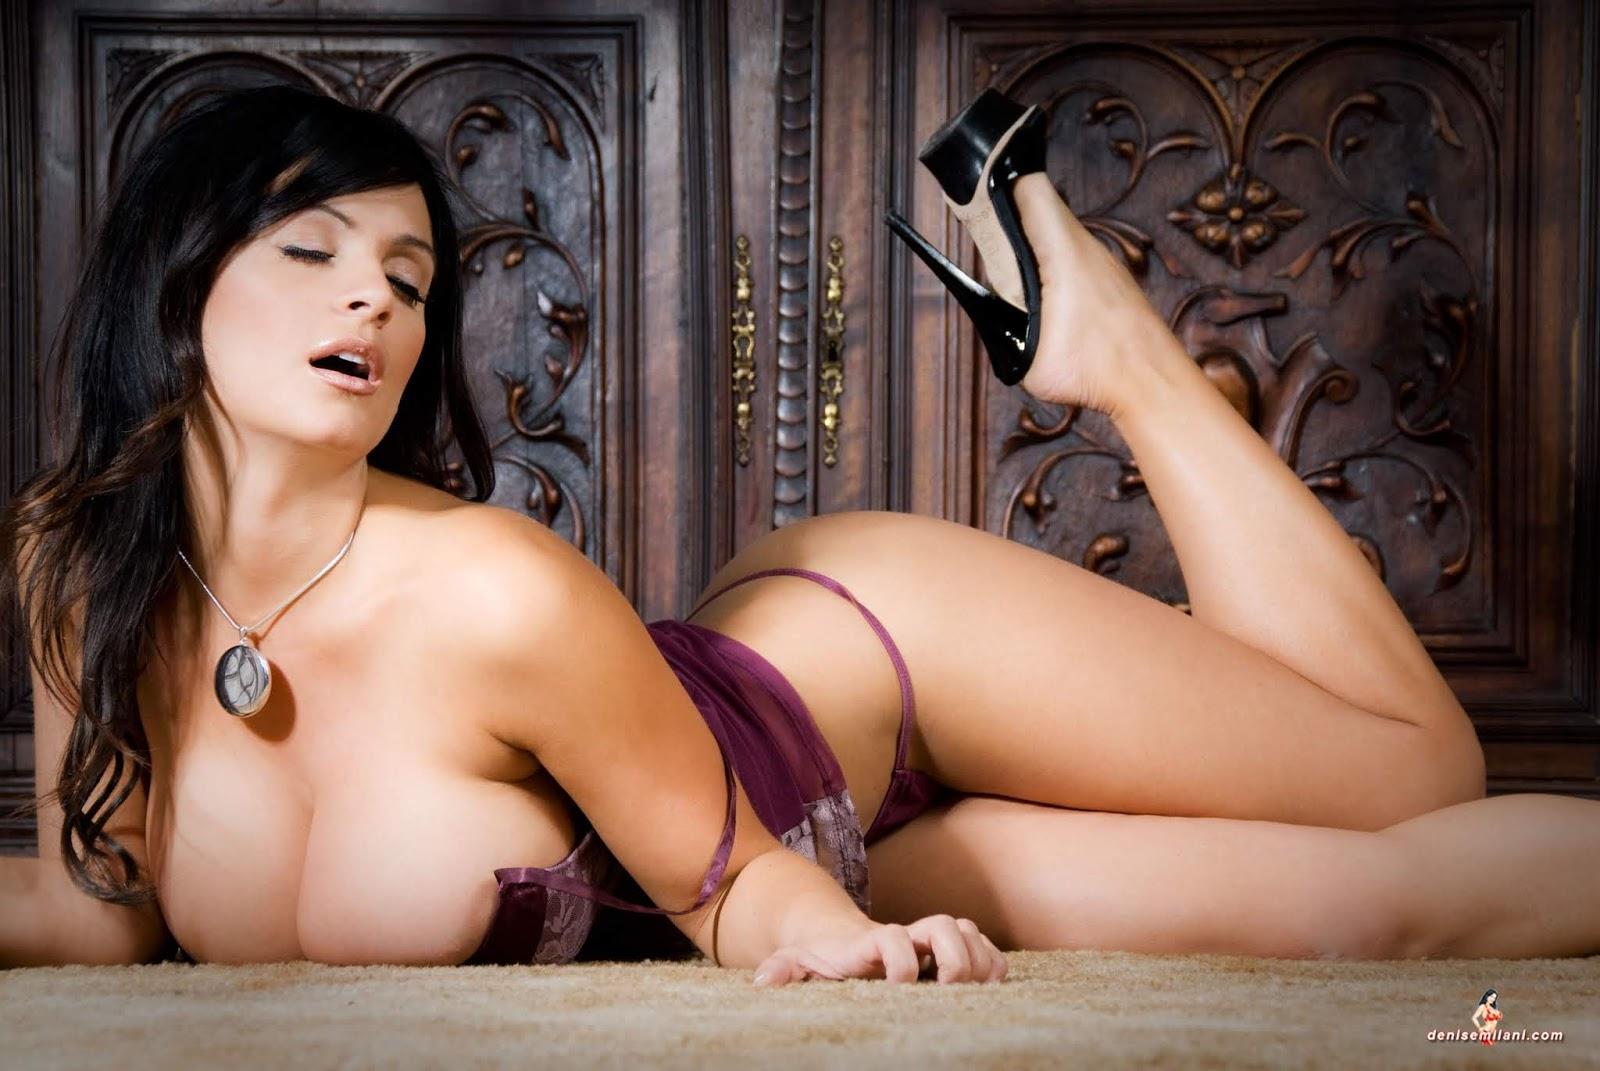 Фото порно денис милани, Denise Milani - все порно и секс фото модели 13 фотография